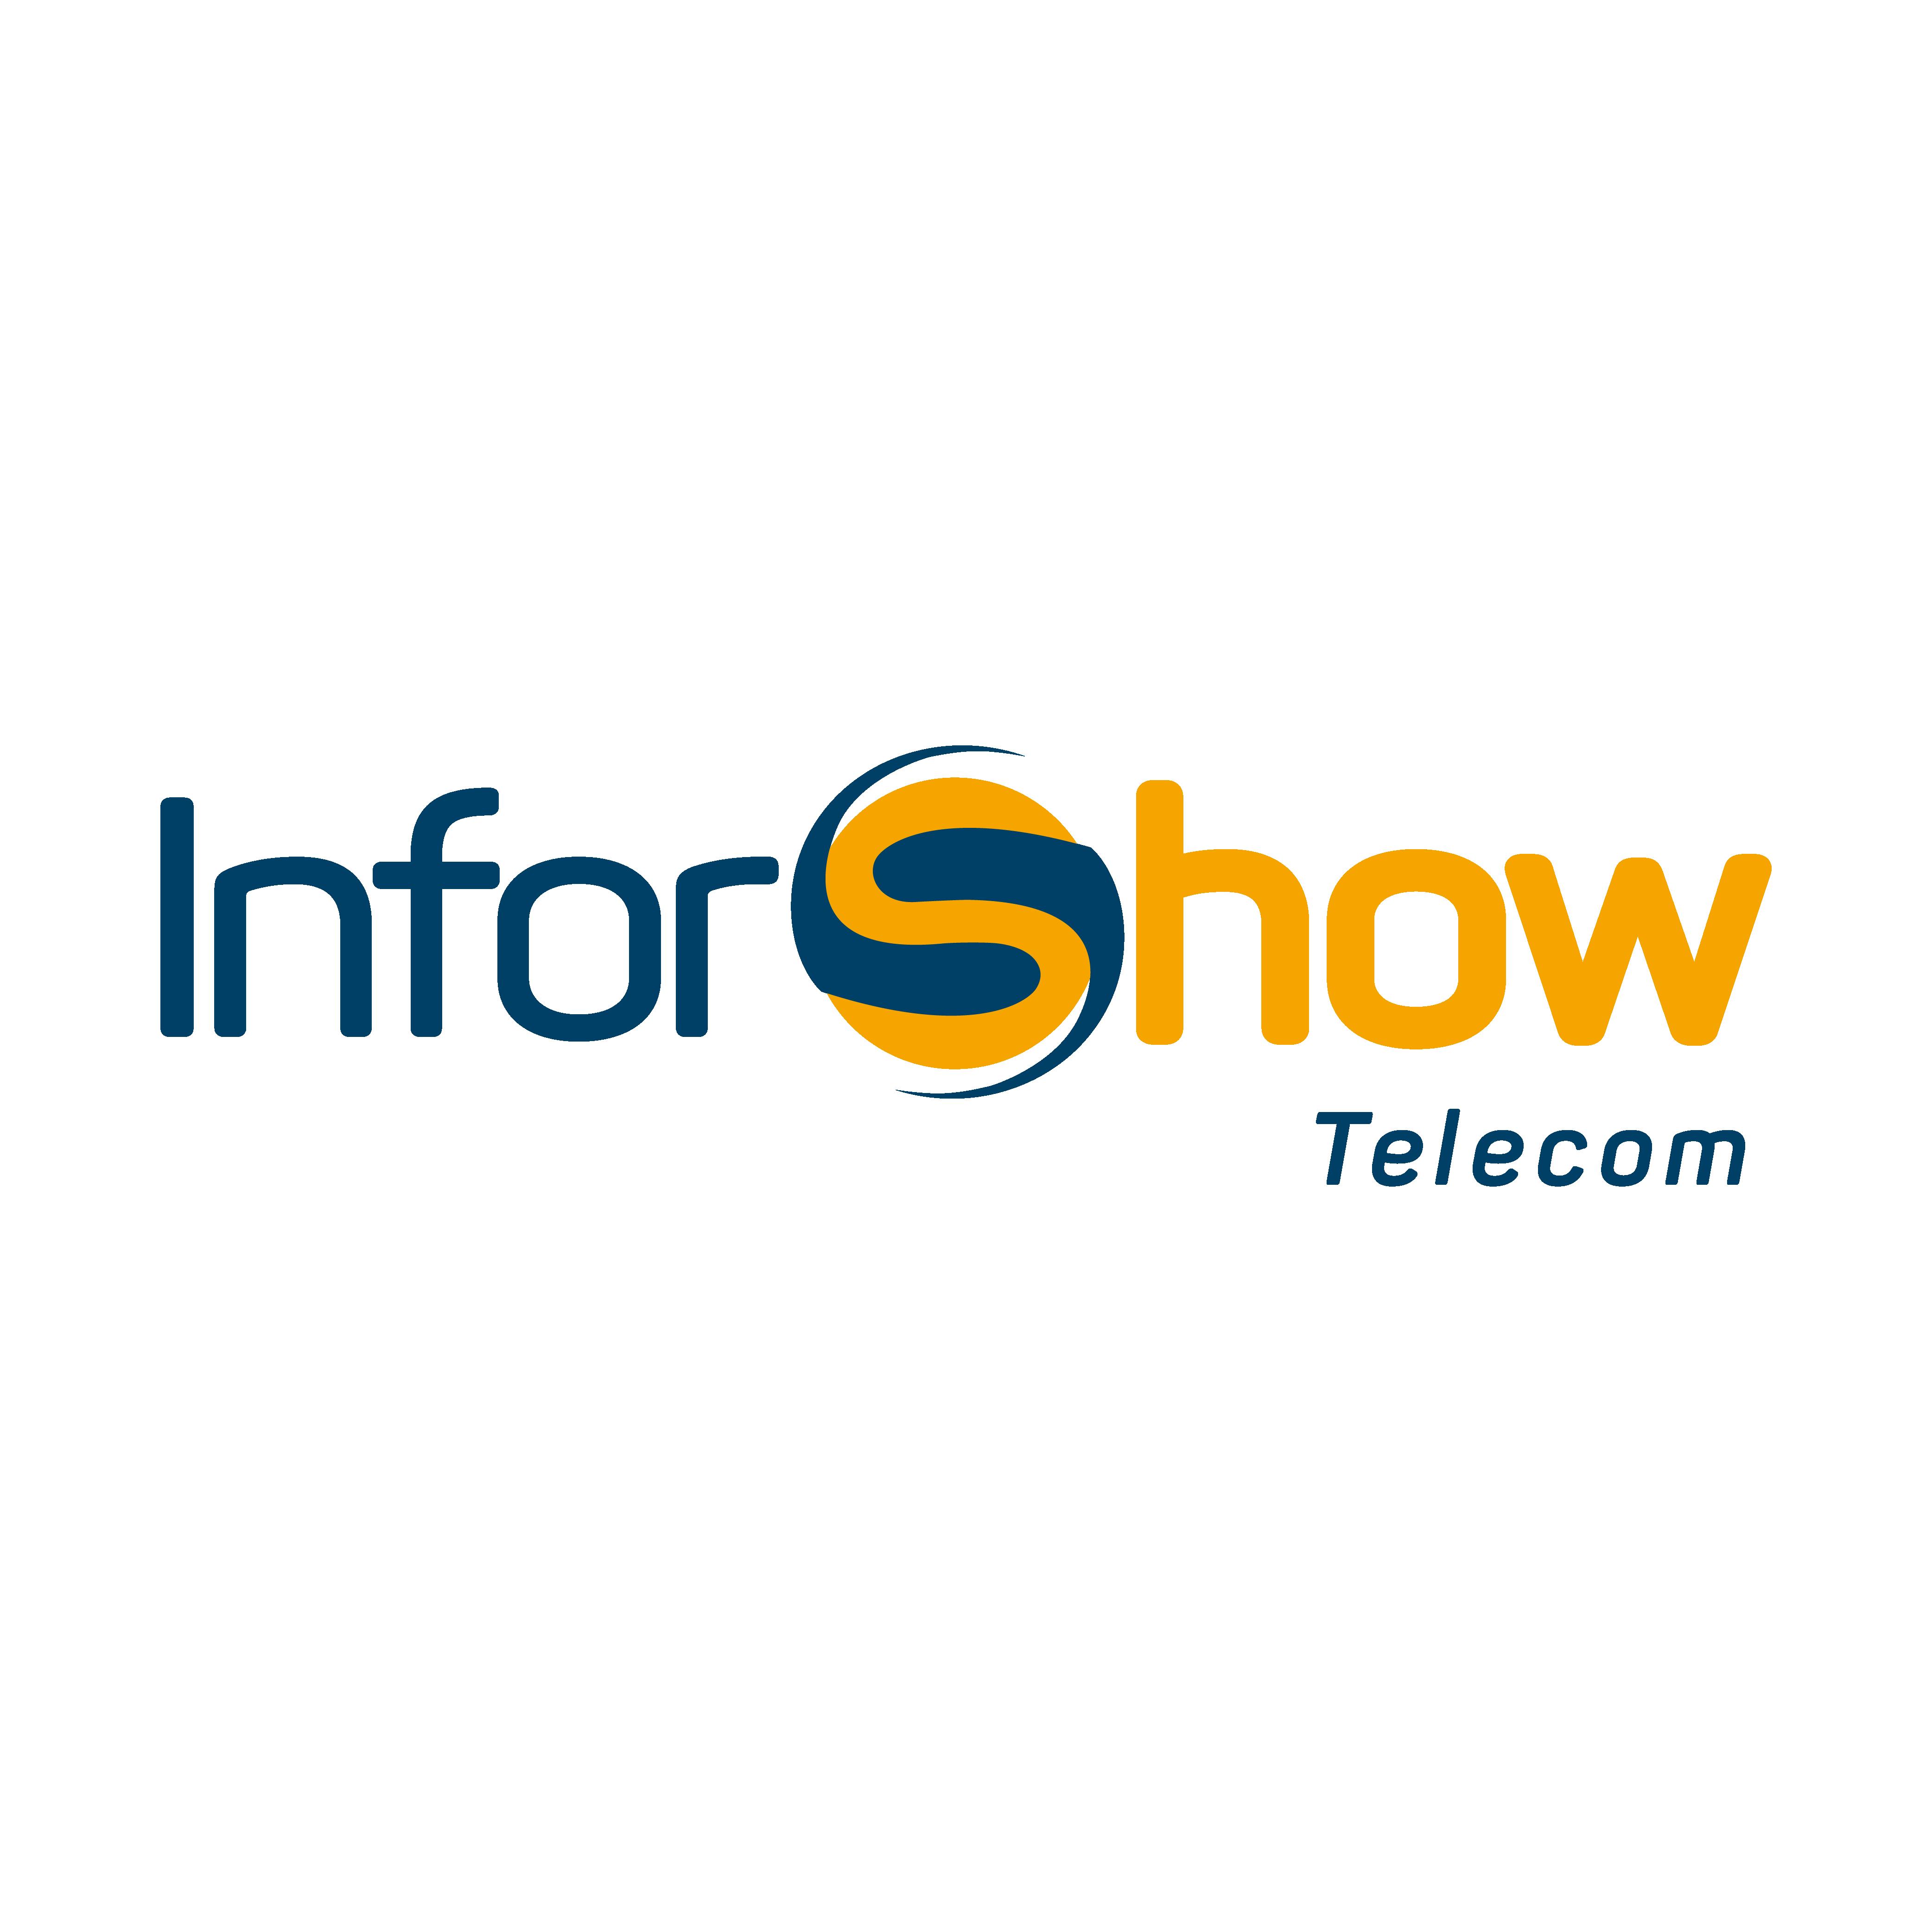 Logo Inforshow